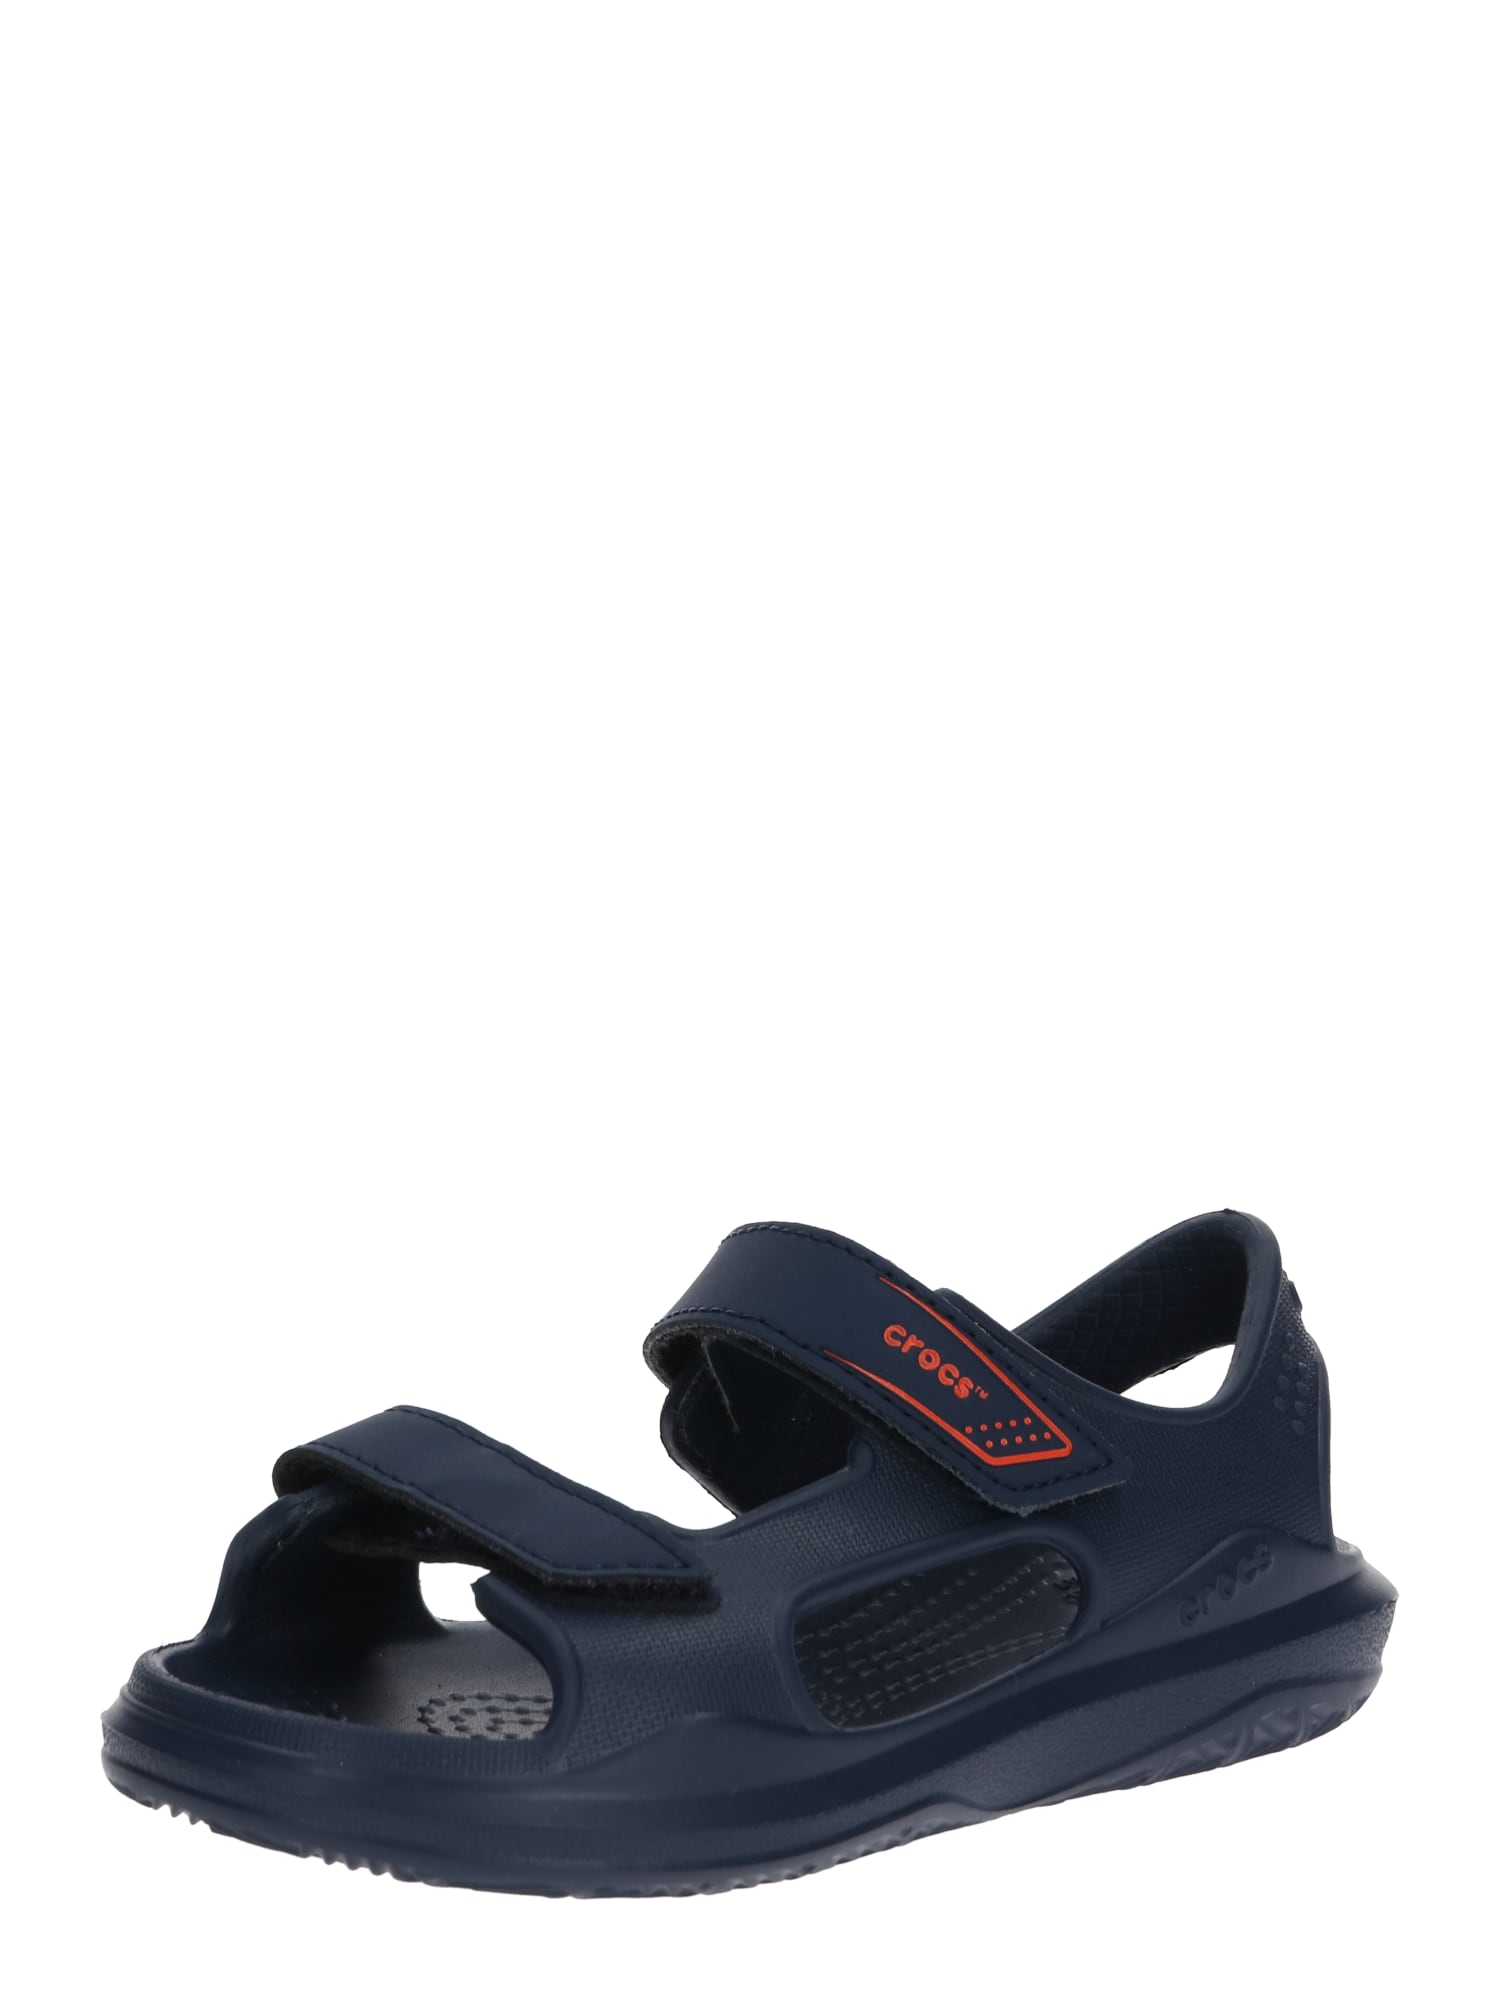 Crocs Atviri batai 'Swiftwater River' tamsiai mėlyna